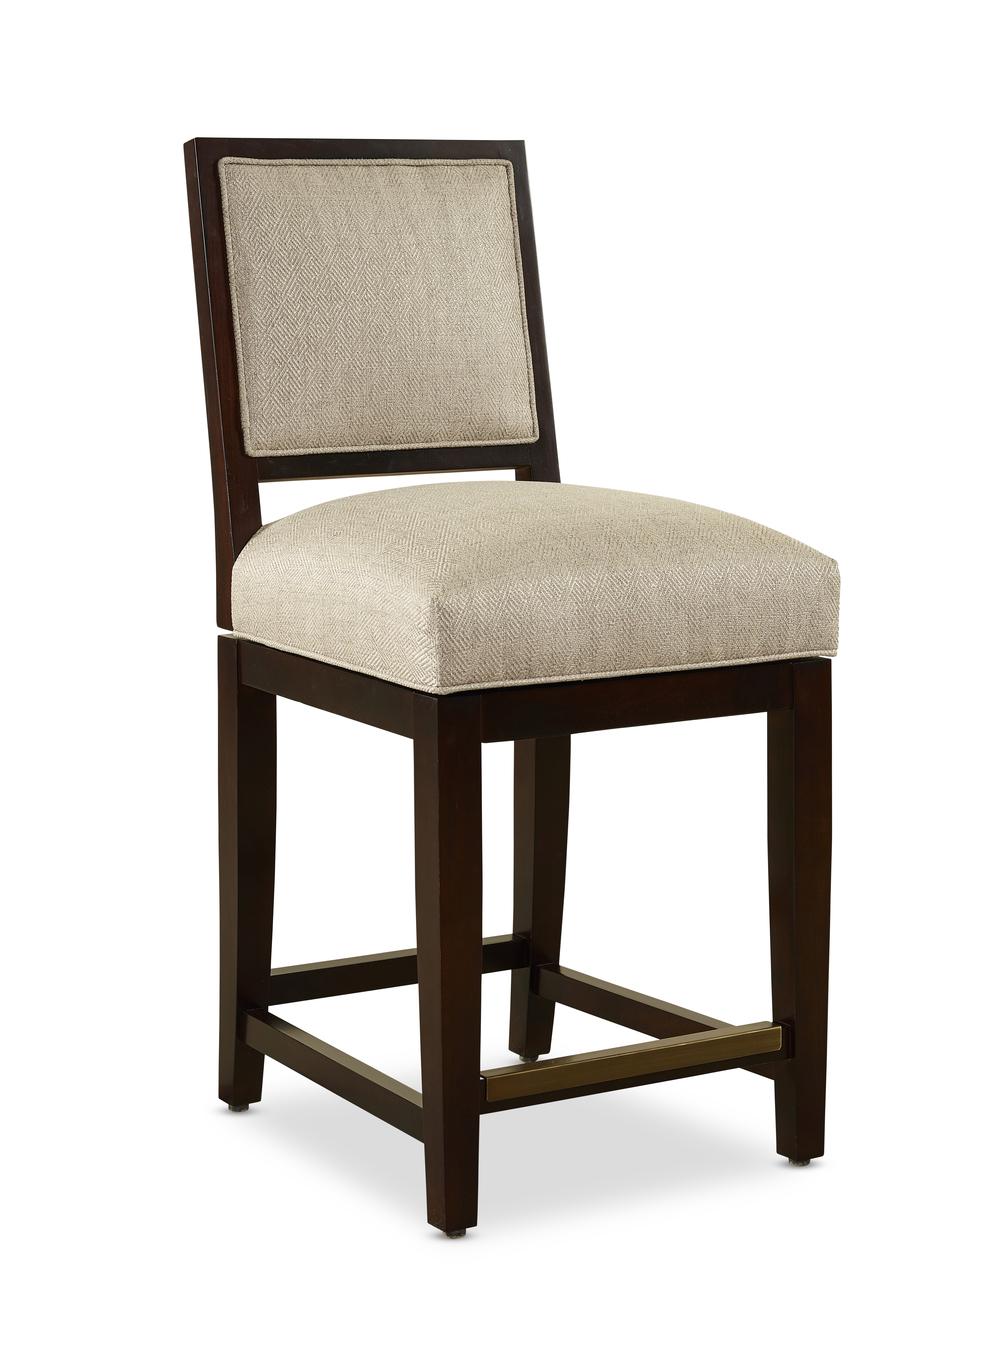 Designmaster Furniture - Geneva Counter Stool